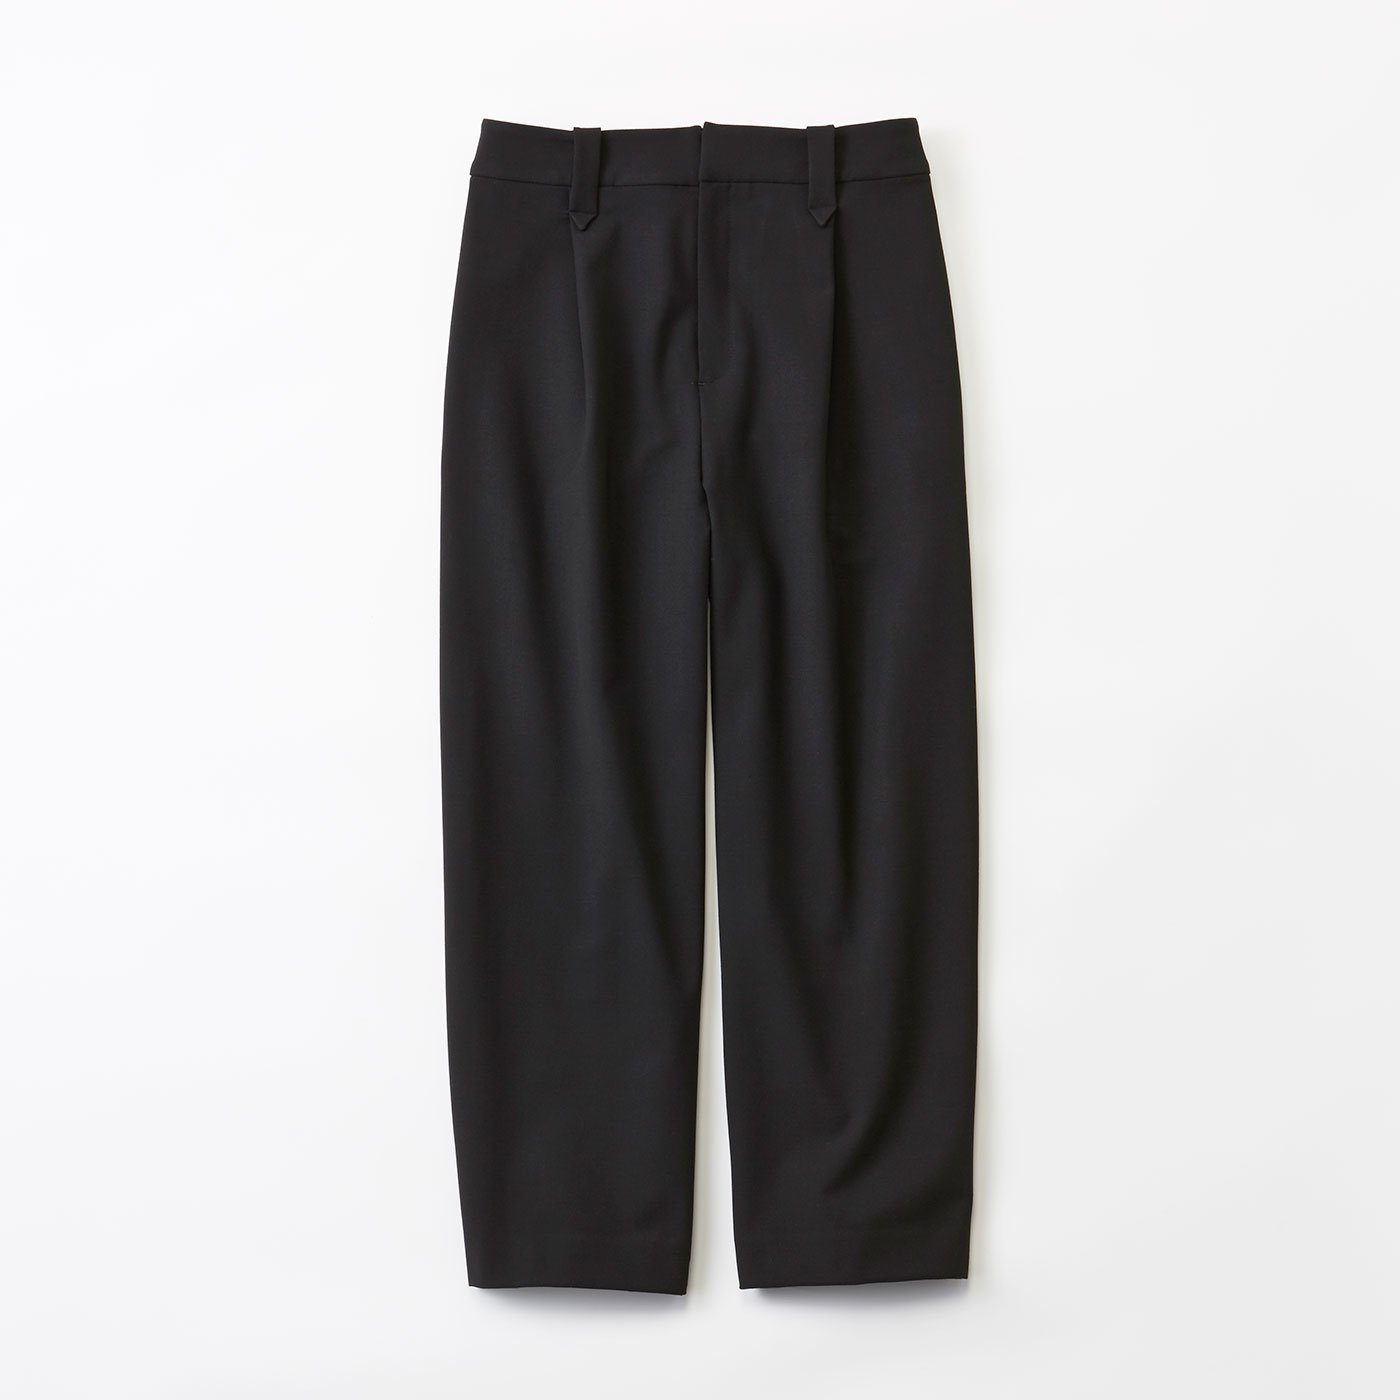 LX 大人女性の着こなし支える 理想のブラックパンツ